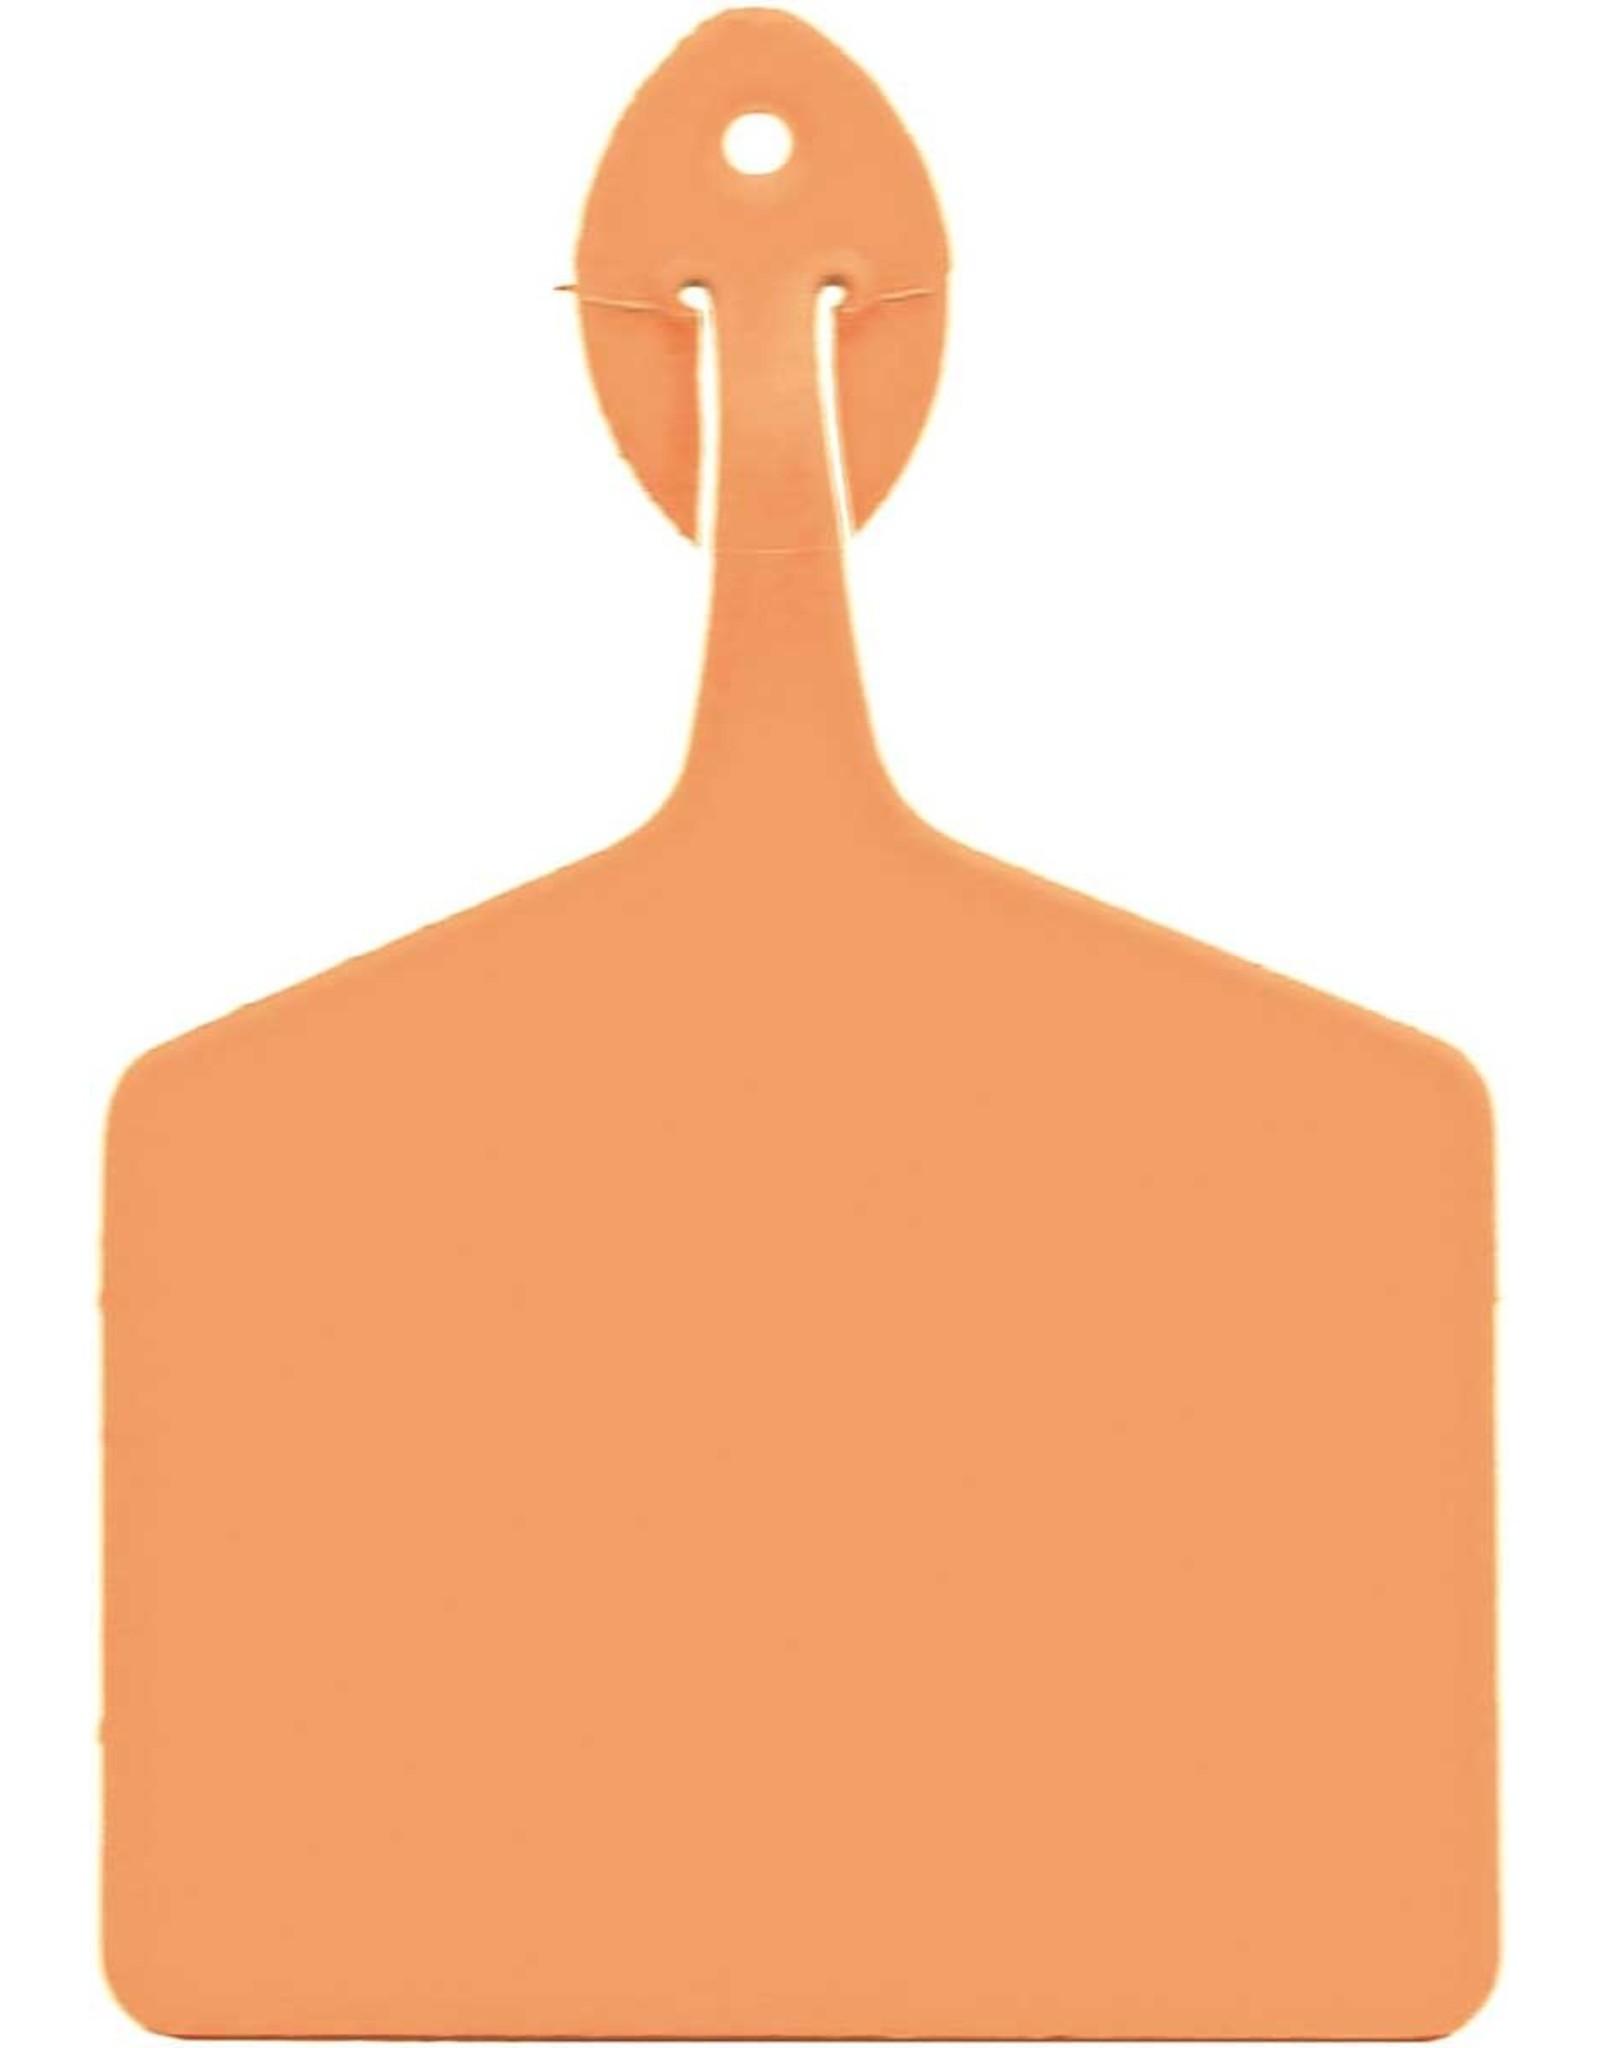 TAG* Allflex Feedlot Tag -  Light Orange - FEEDLOLOR 50pcs long package